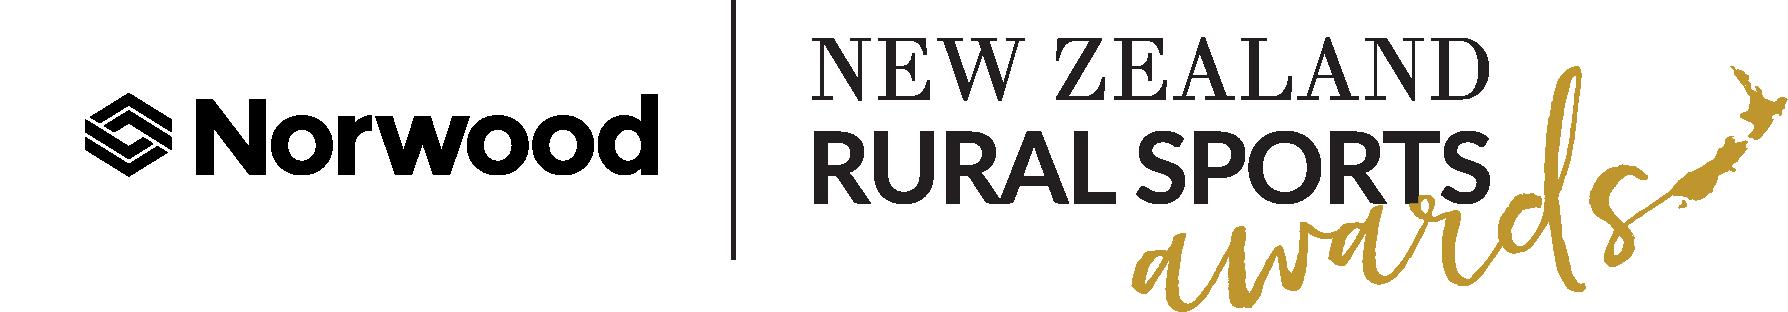 NZ Rural Sports Awards